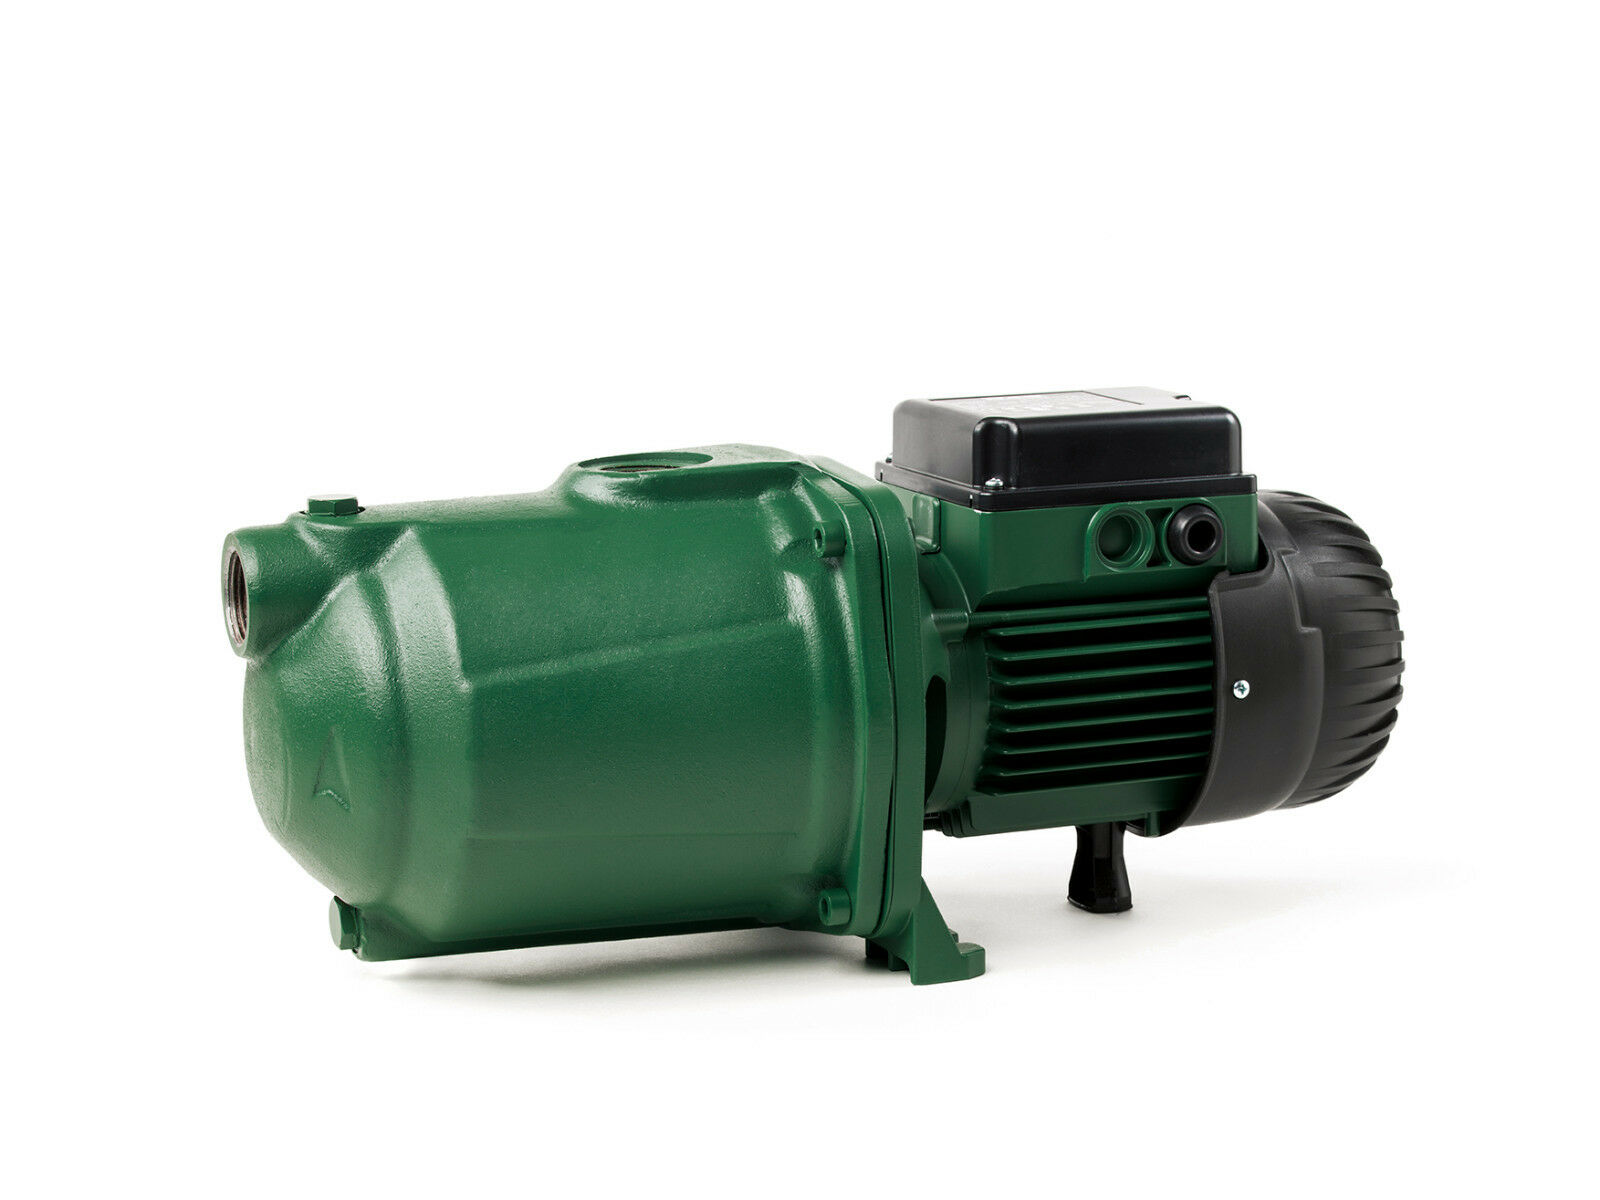 Elettropompa Centrifuga Multistadio DAB EURO 30 30 M 0,45 kW 220-240 V